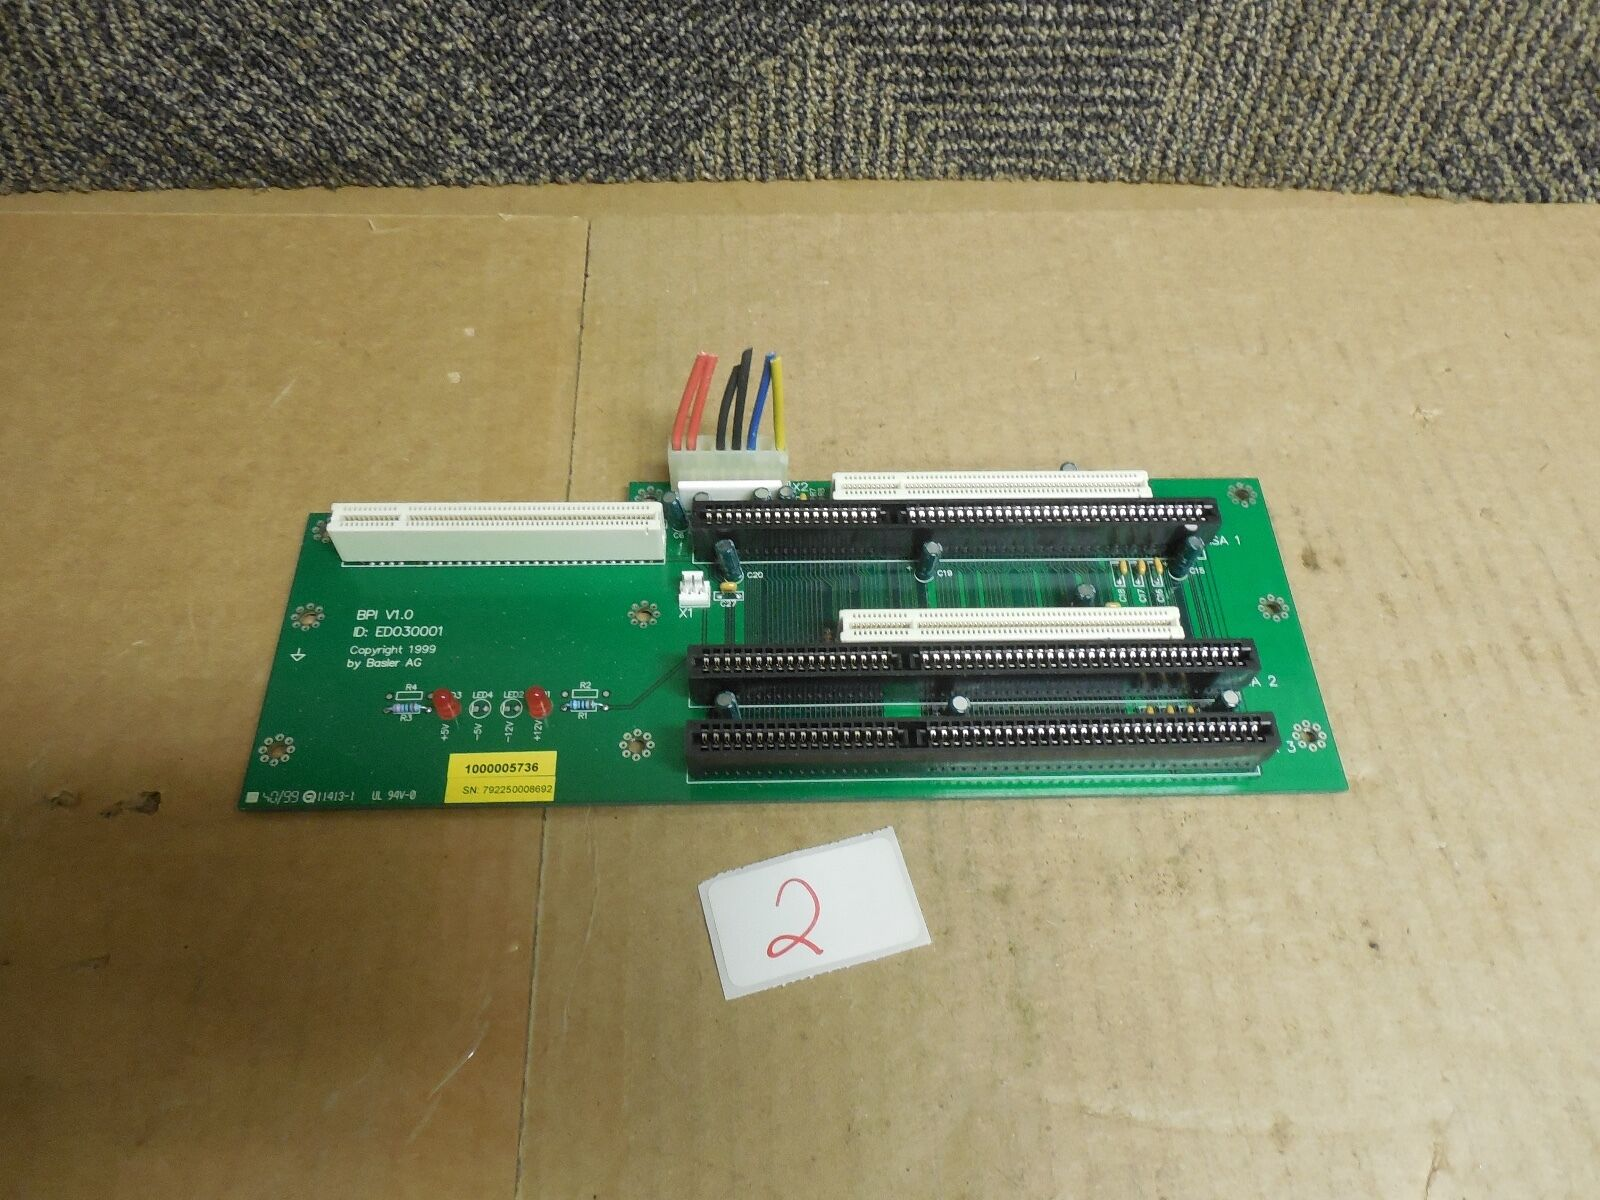 BASLER AG TERMINAL CIRCUIT BOARD CARD BPI V1.0 ED030001